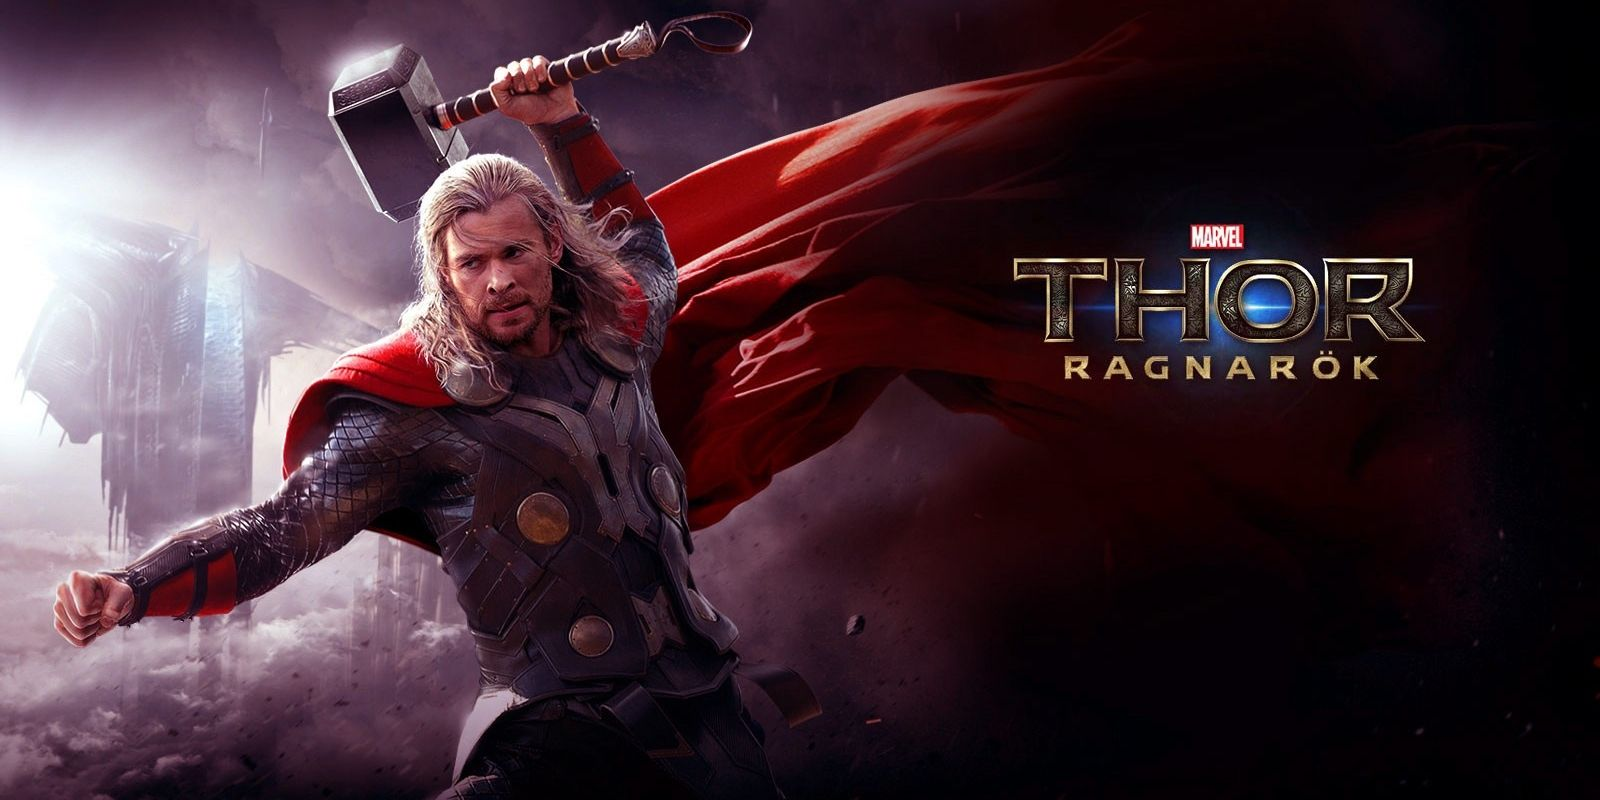 Thor: Ragnarok Backgrounds on Wallpapers Vista